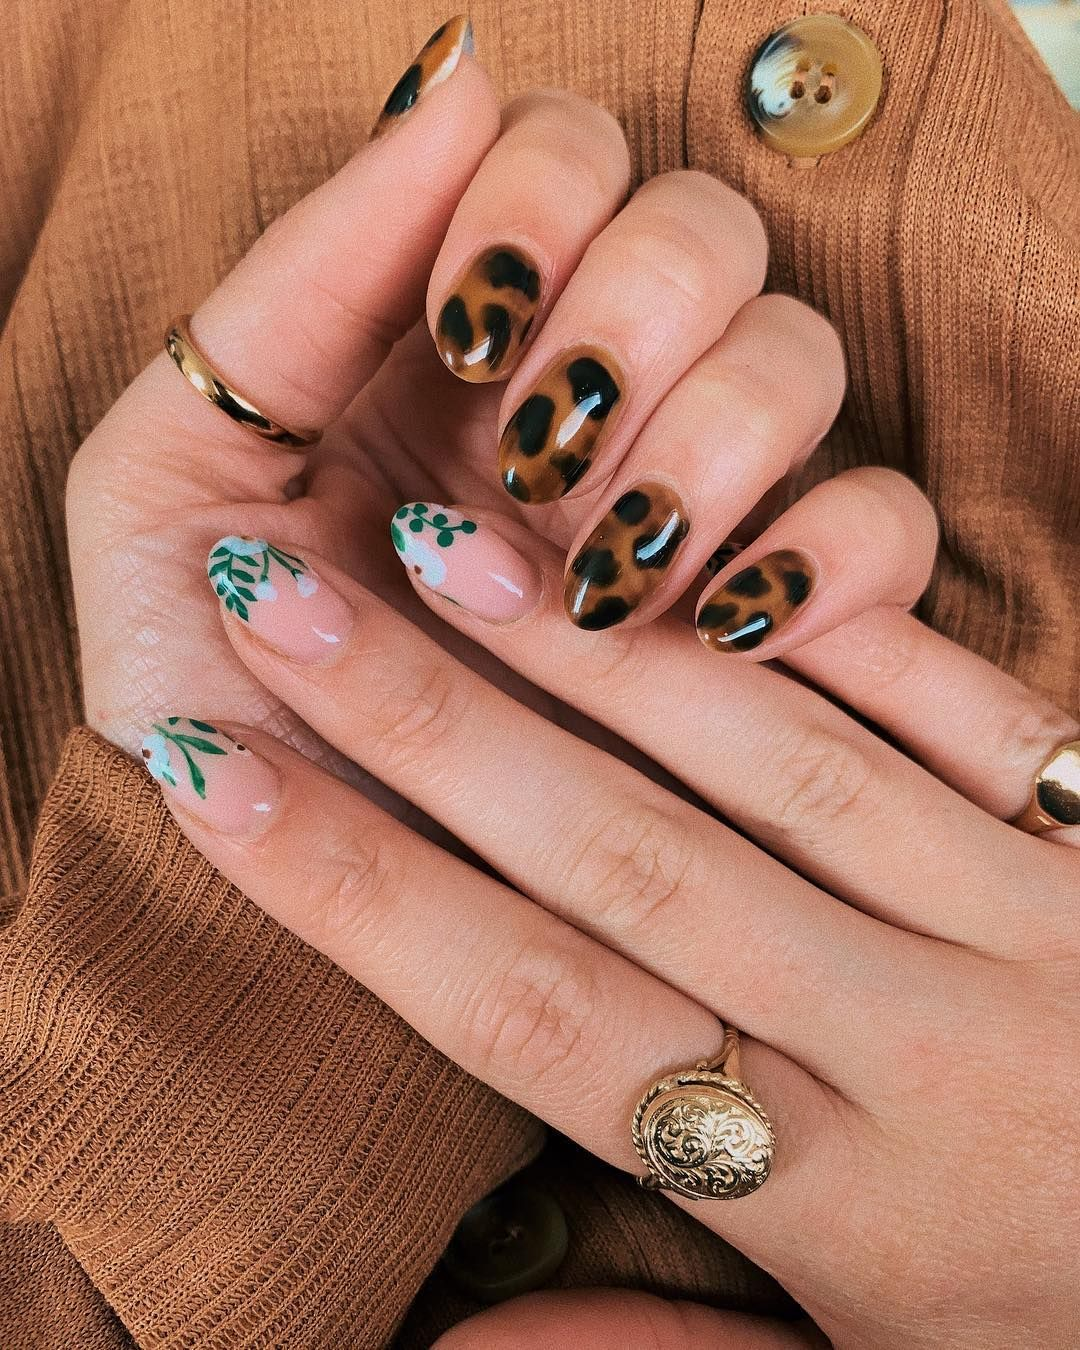 8 animal nailart ideas to try Checkout these 8 animal nailart manicures for the summer Photo credit emilyjanelathan